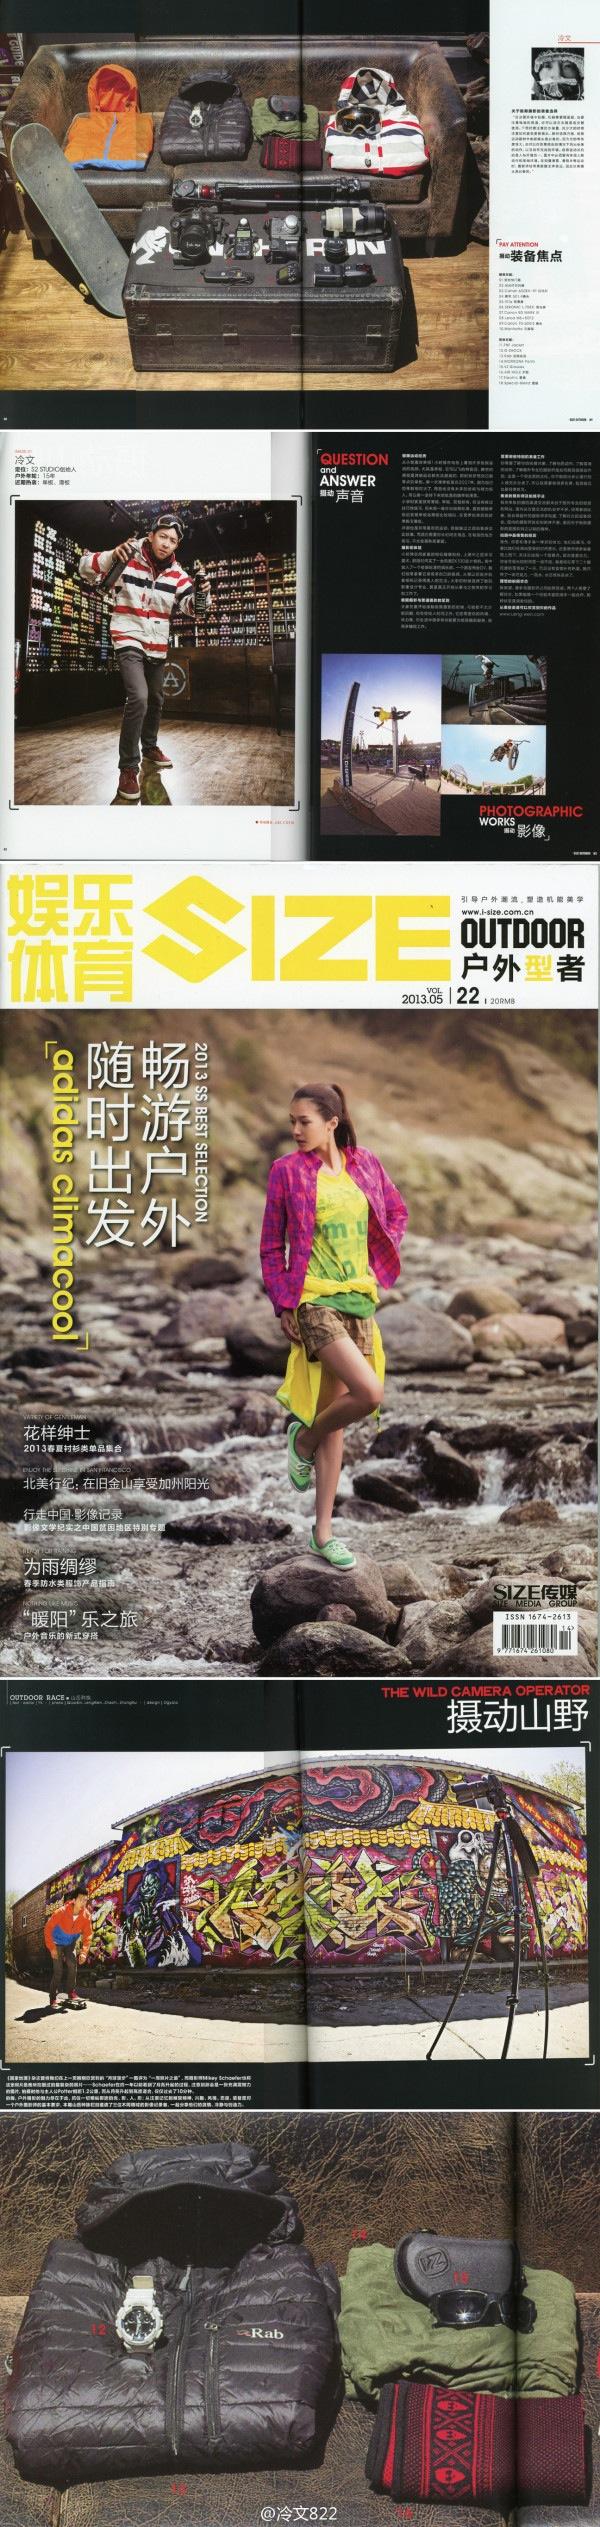 VZ上户外行者杂志